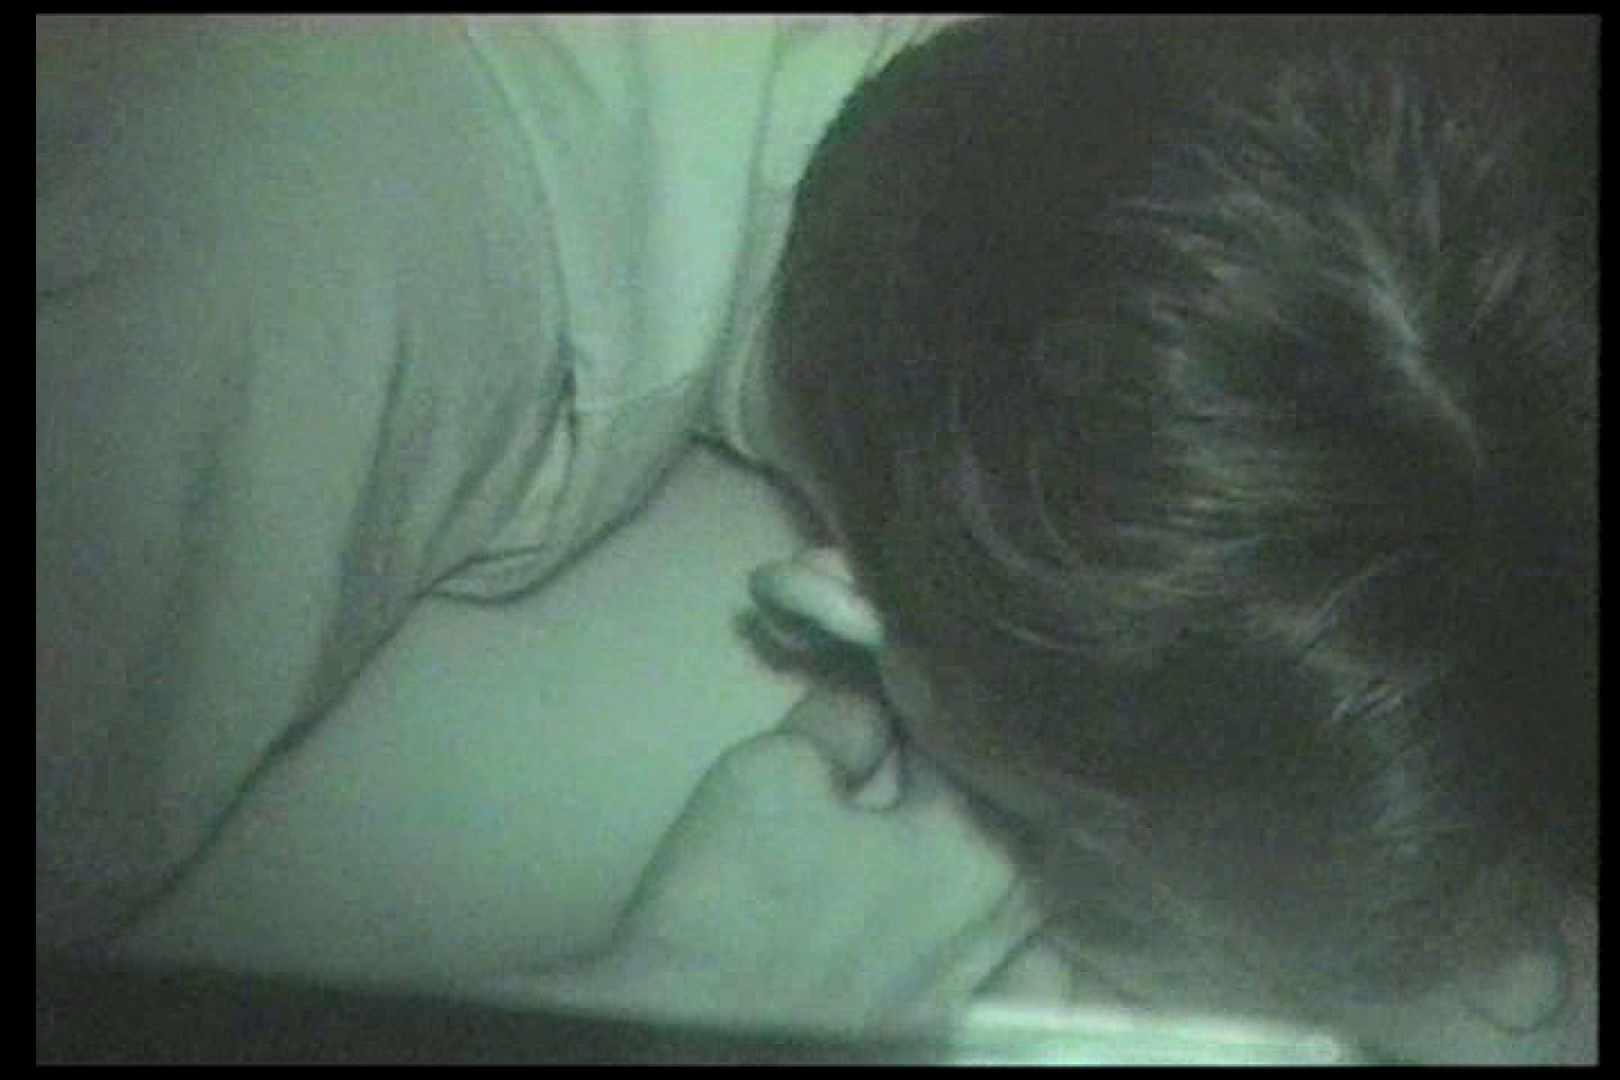 カーセックス未編集・無修正版 Vol.6後編 美女OL 濡れ場動画紹介 76連発 56